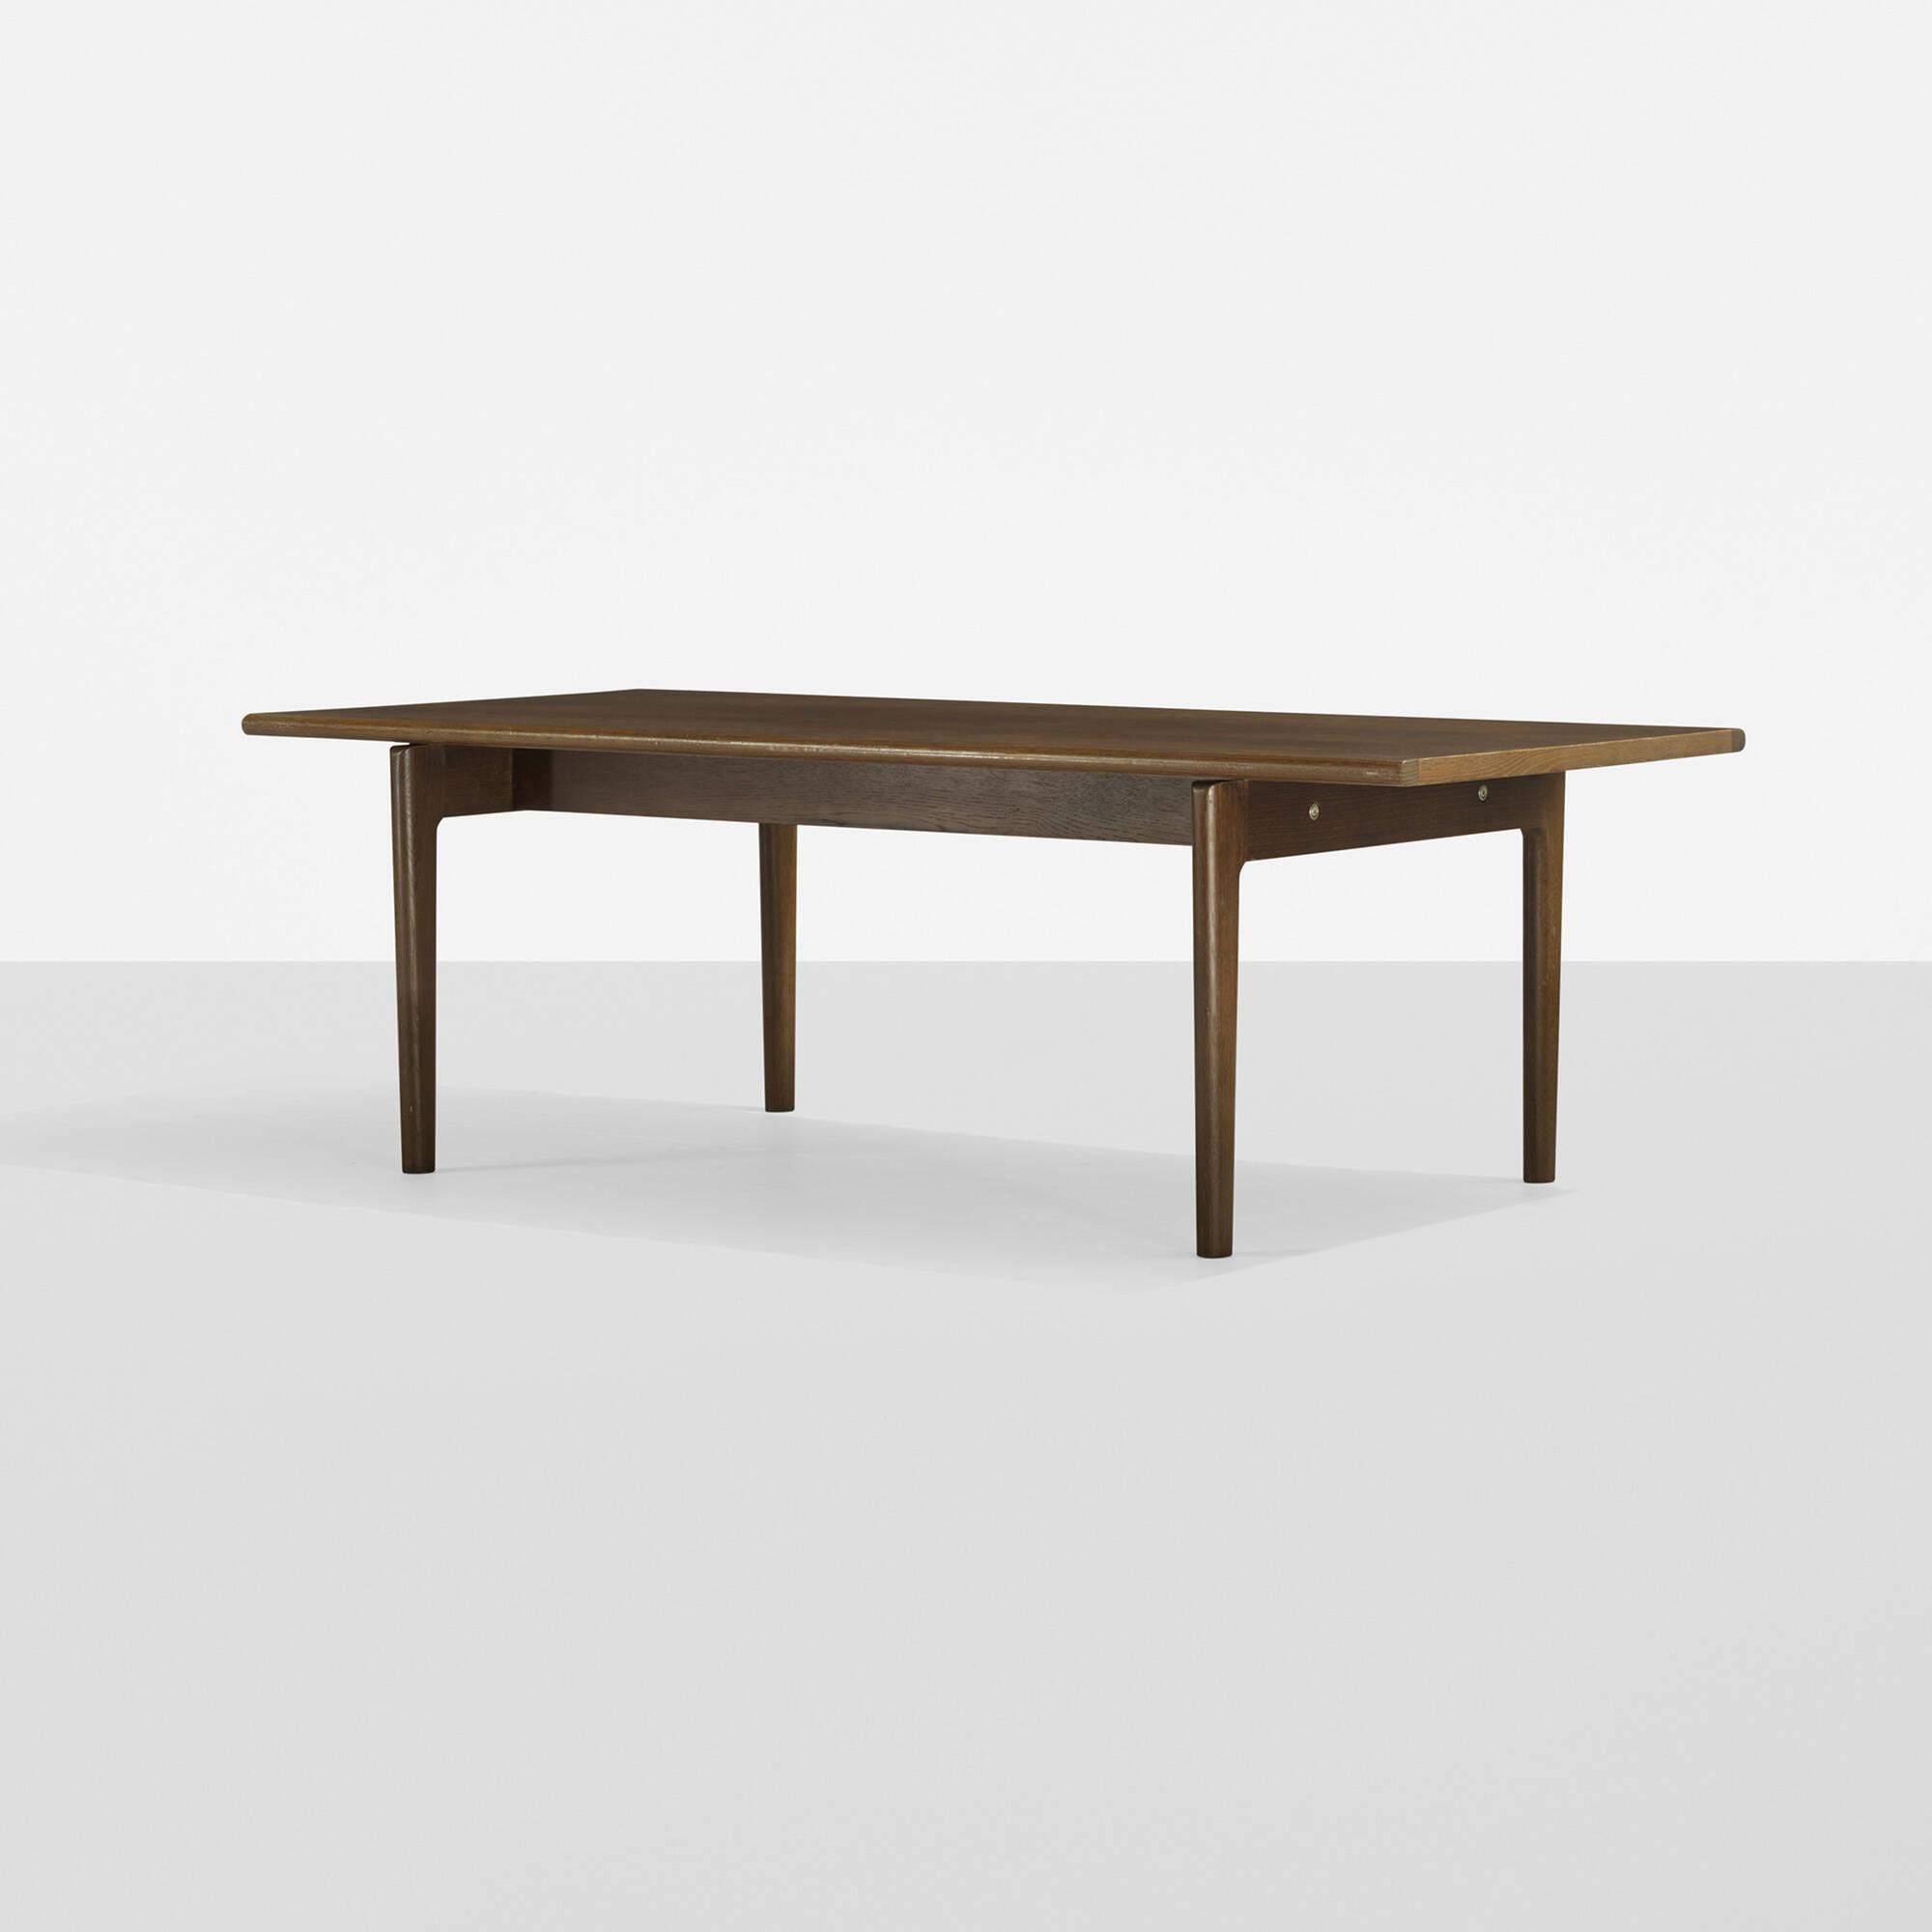 215 Hans J Wegner Coffee Table